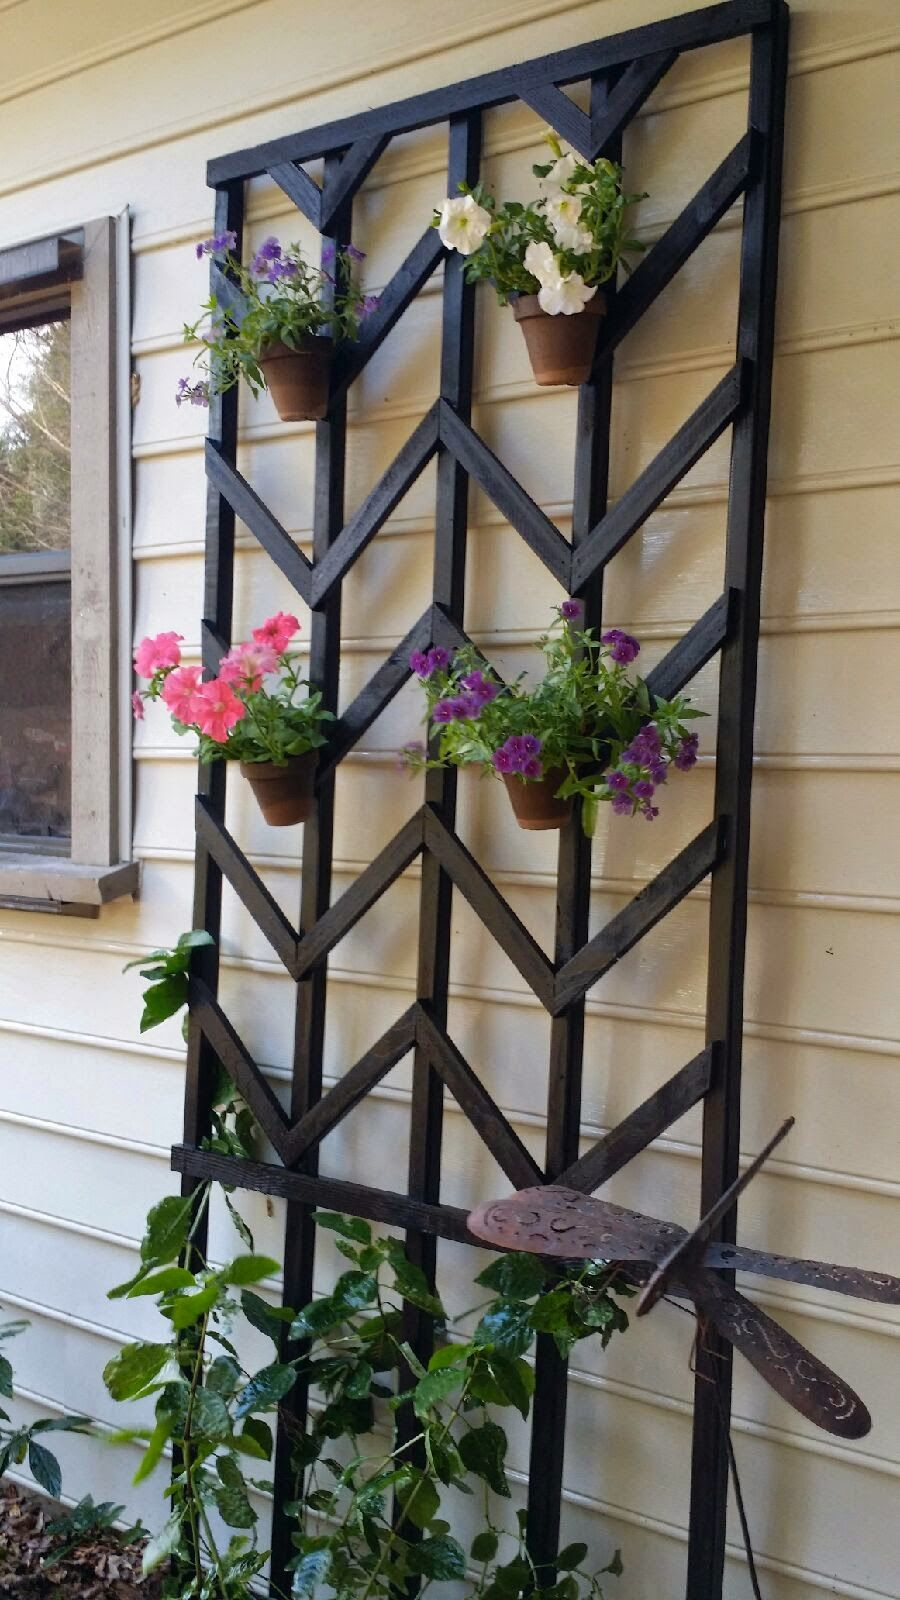 diy chevron lattice trellis tutorial flower gardens and backyard